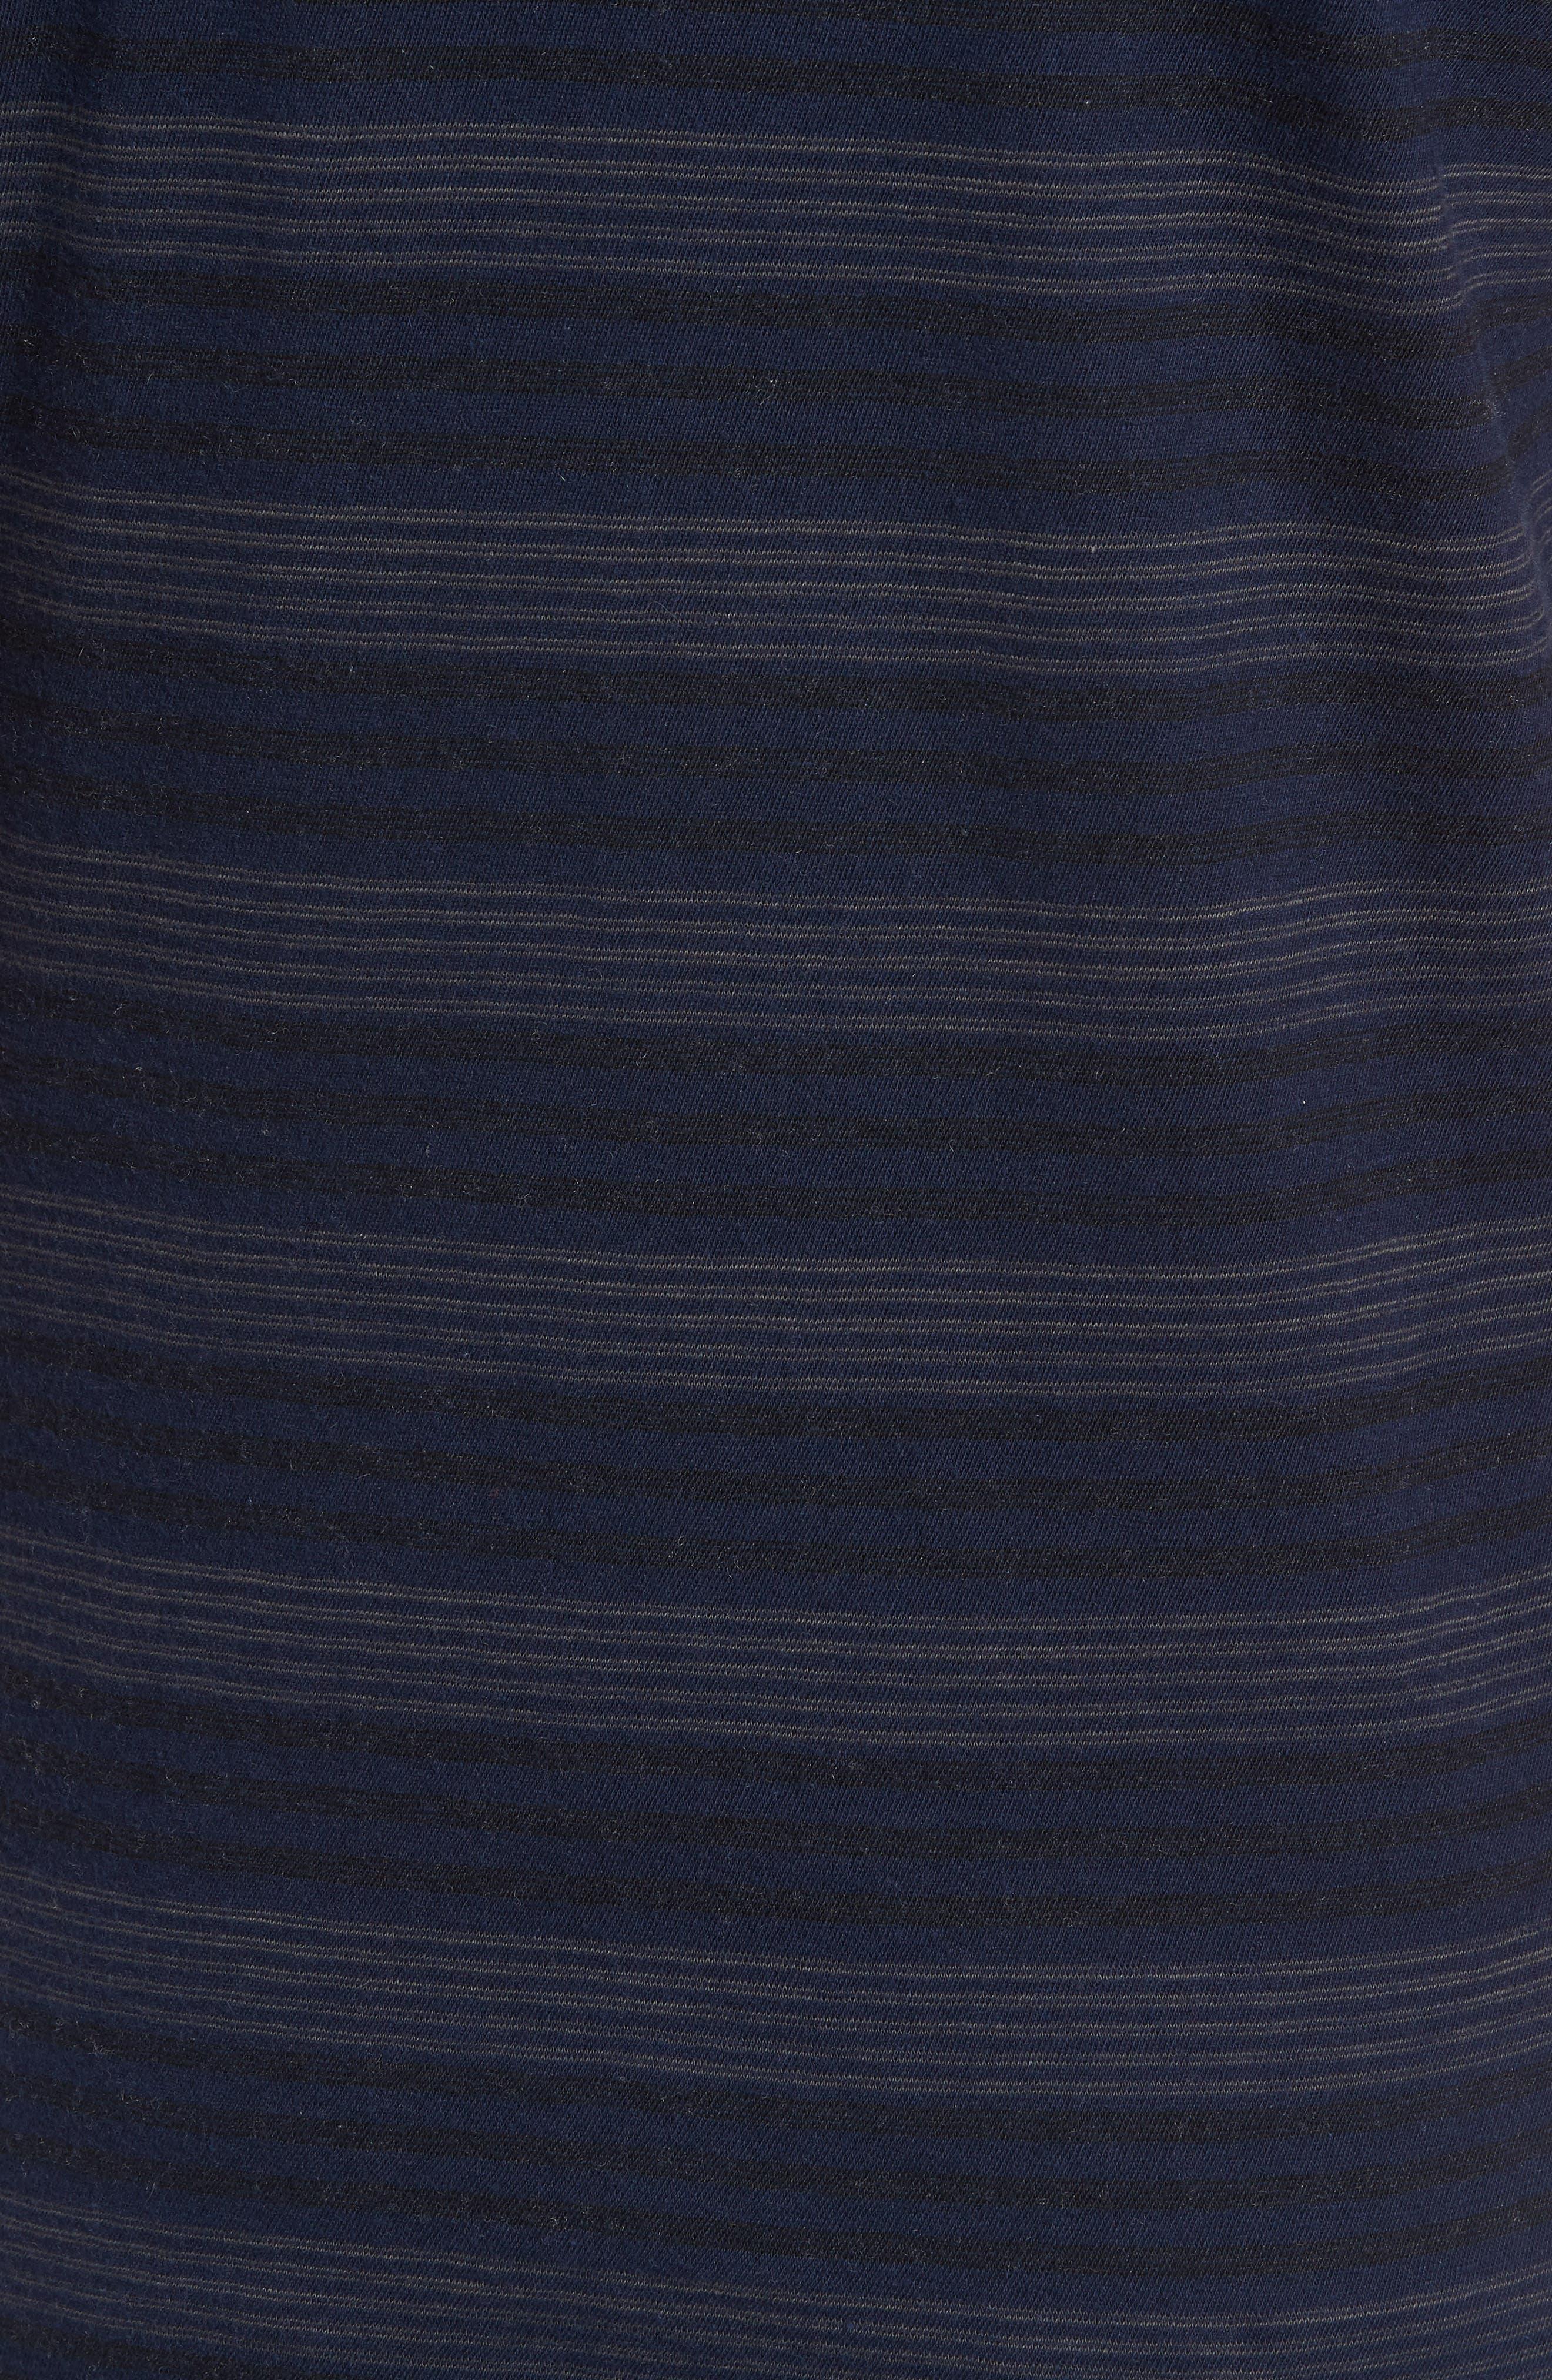 Stripe Cotton & Cashmere Polo Shirt,                             Alternate thumbnail 5, color,                             Navy